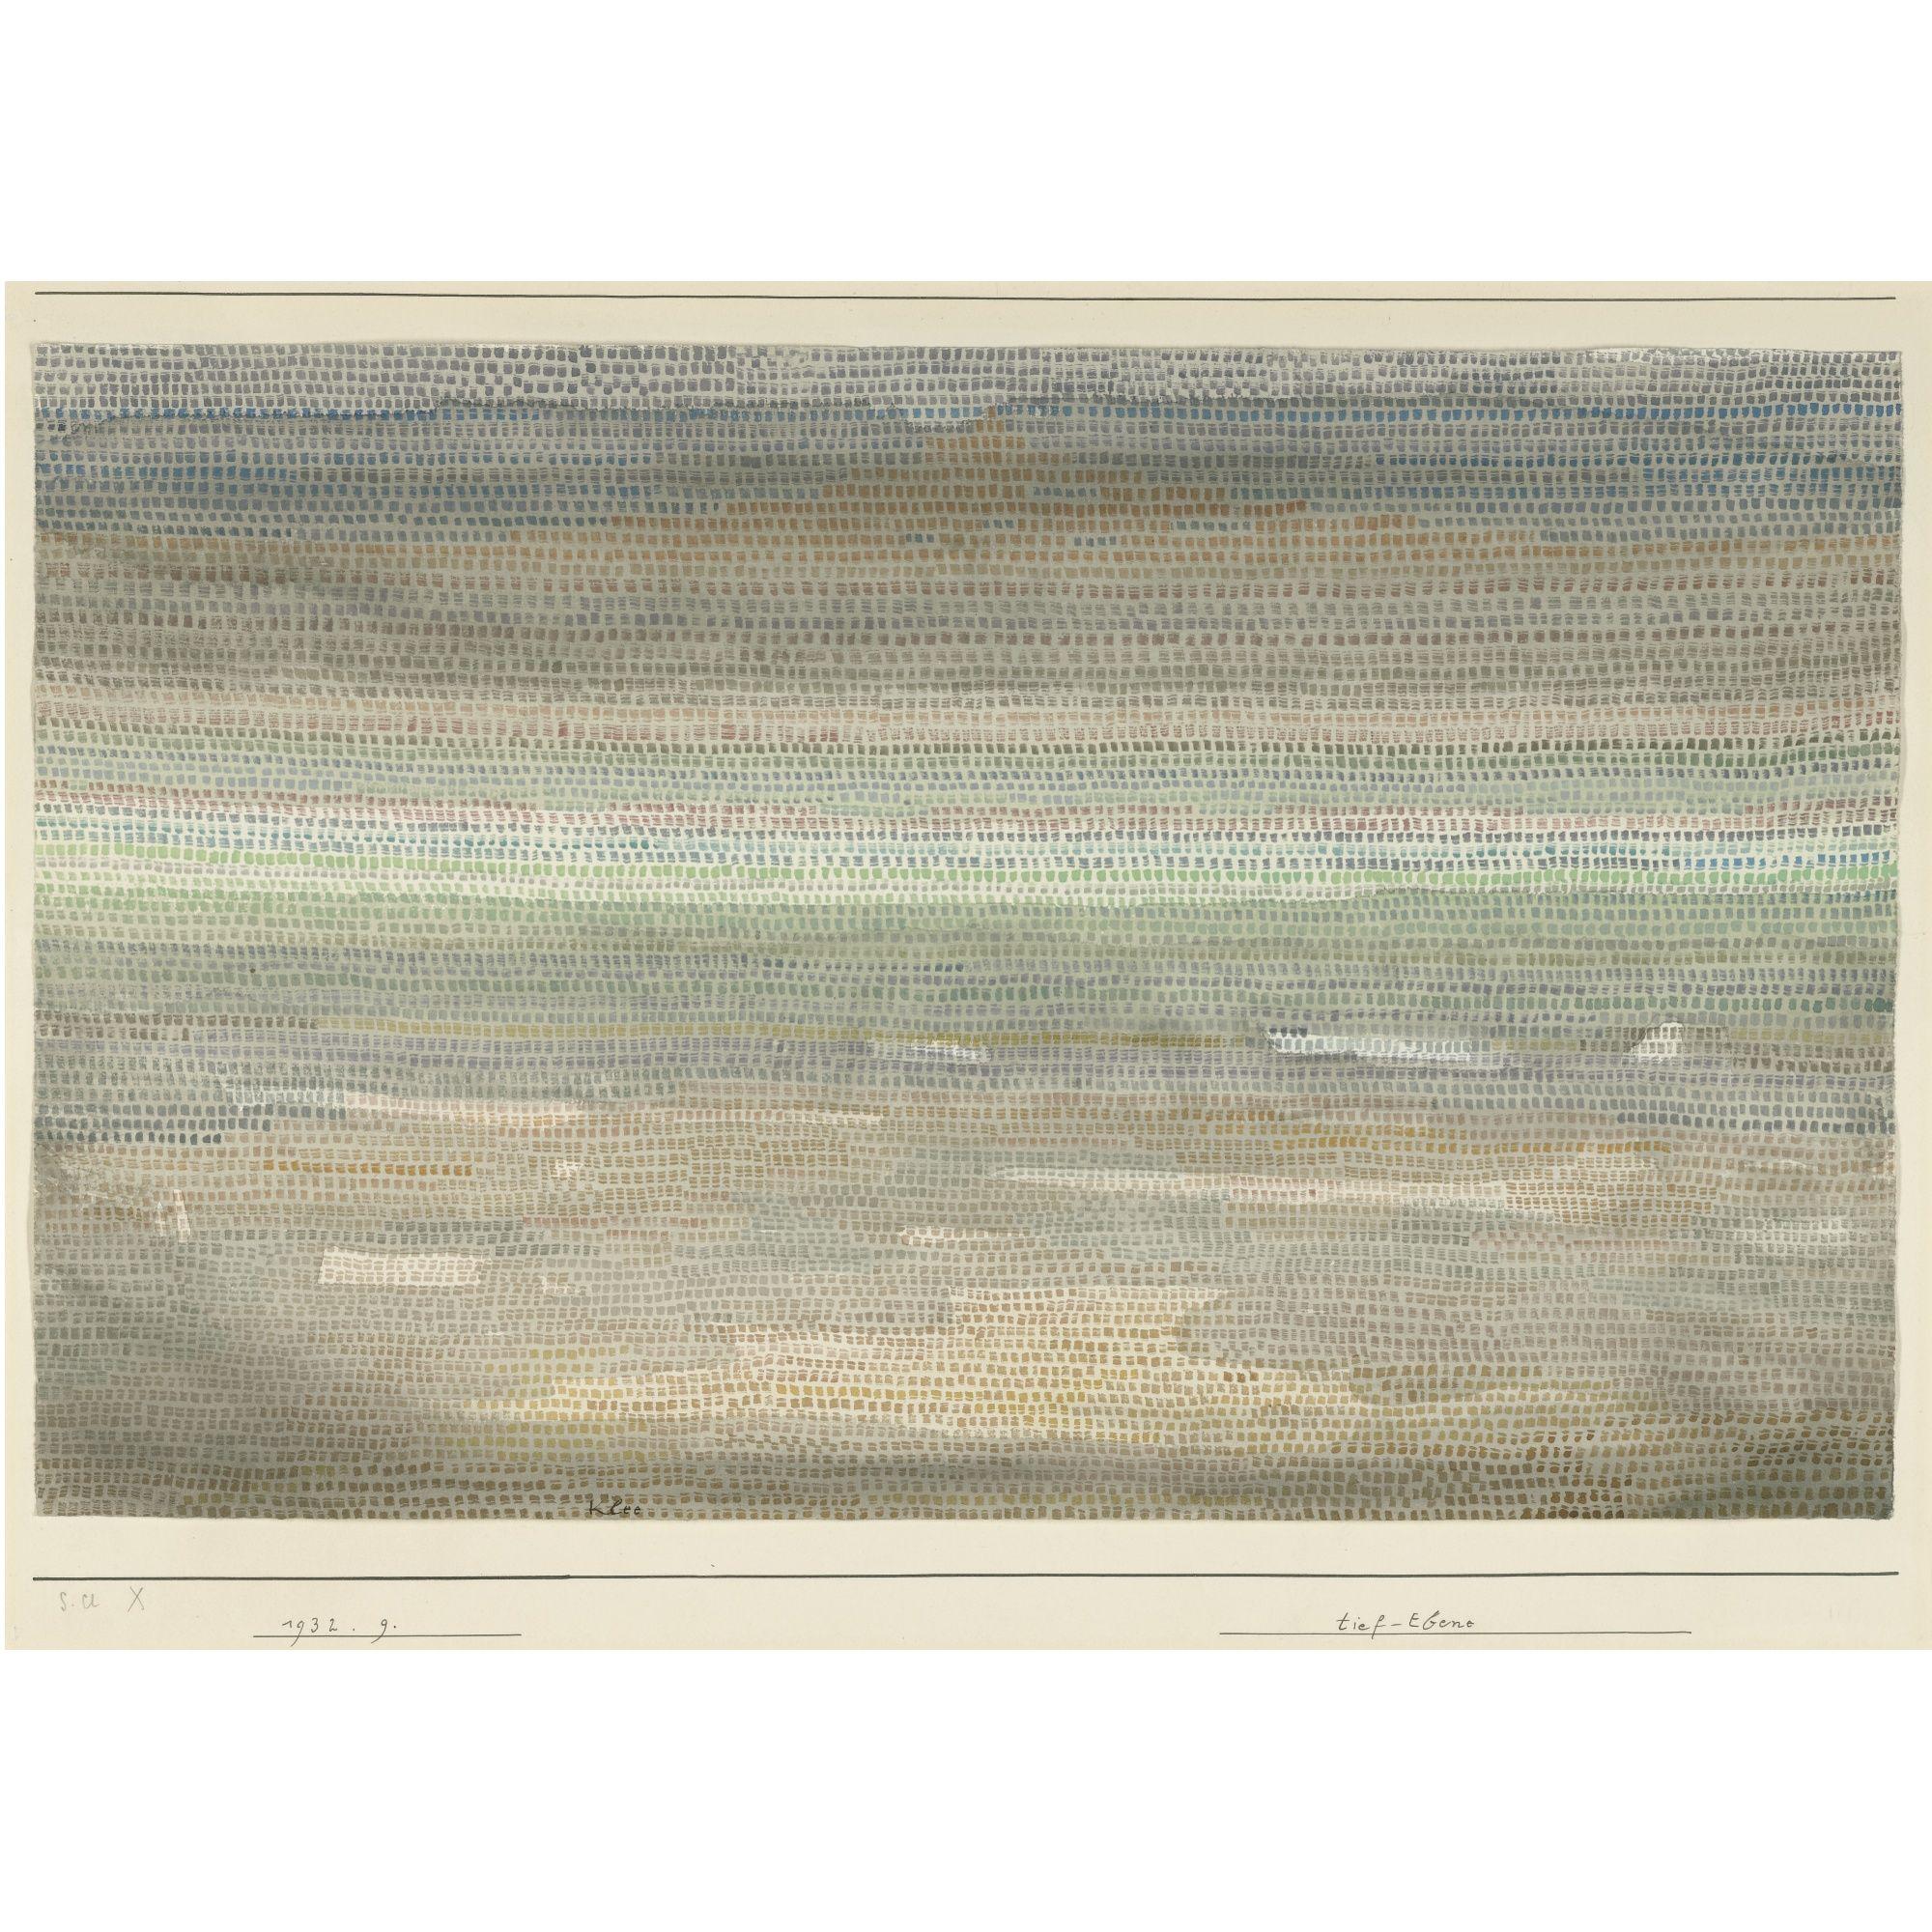 Paul Klee: Lowlands, 1932 (Sotheby's)